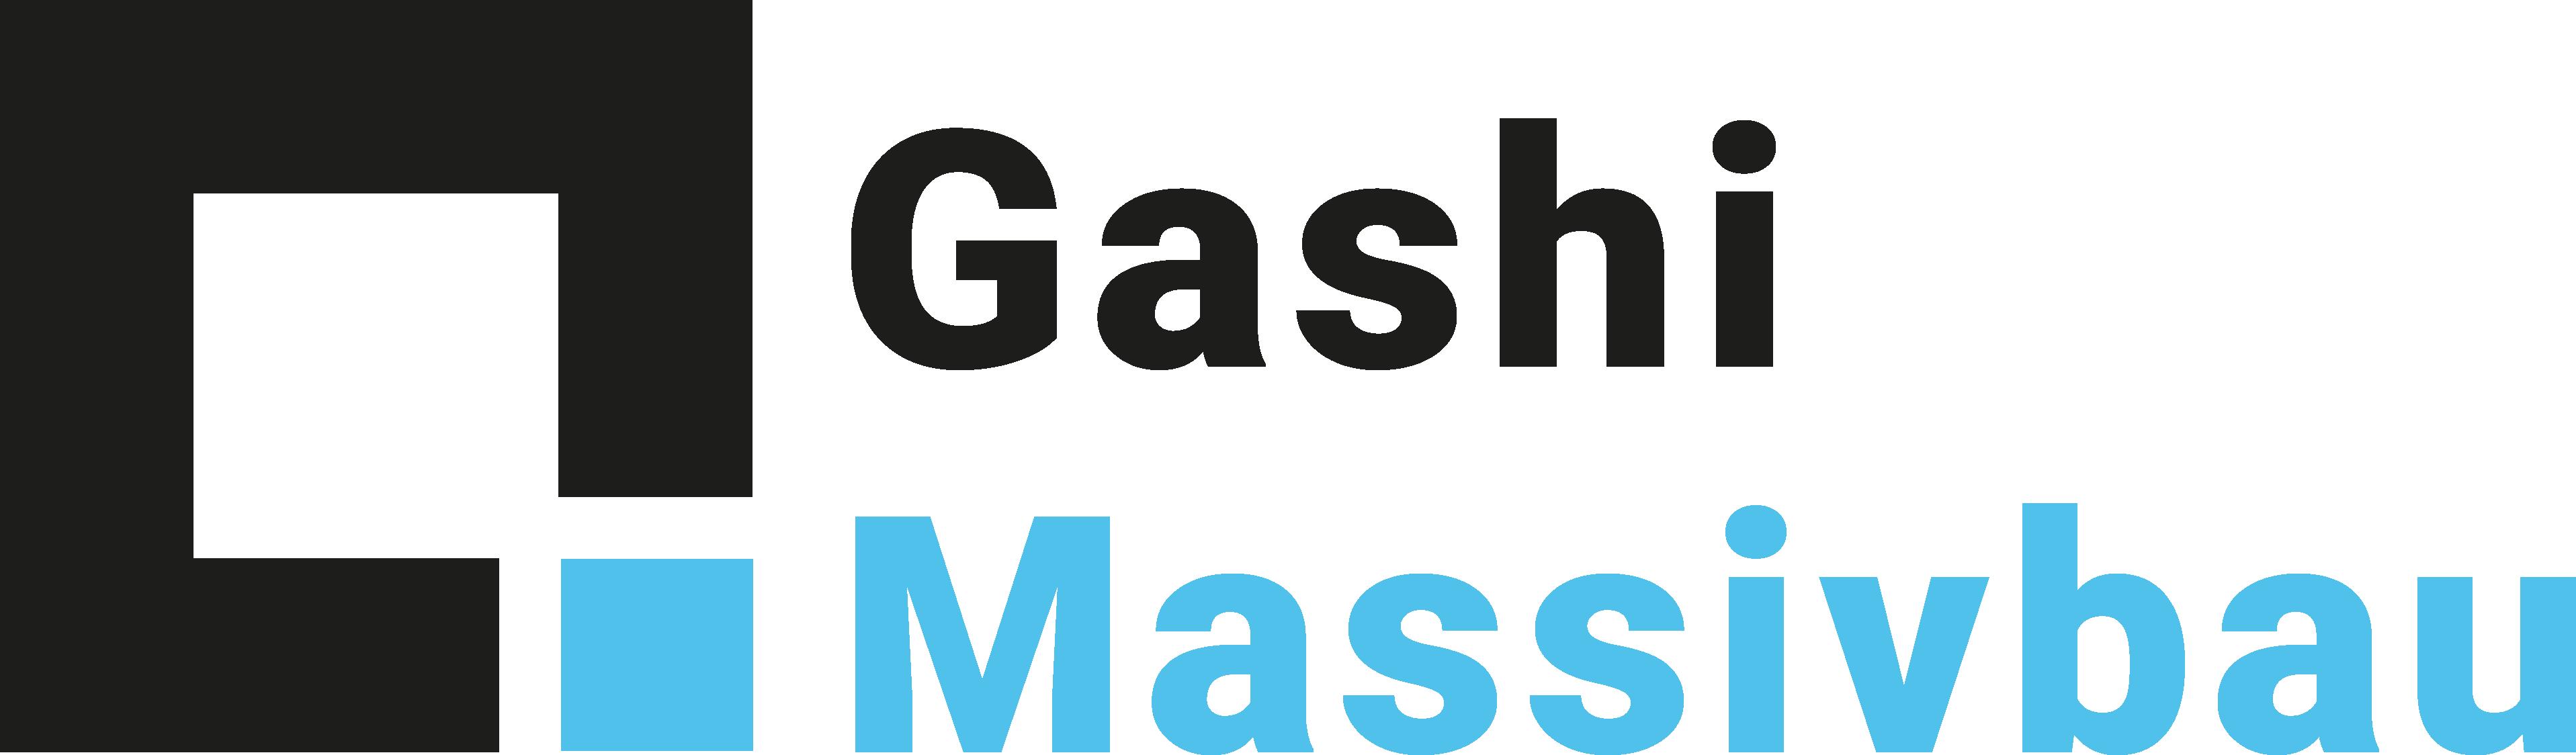 Gashi Massivbau